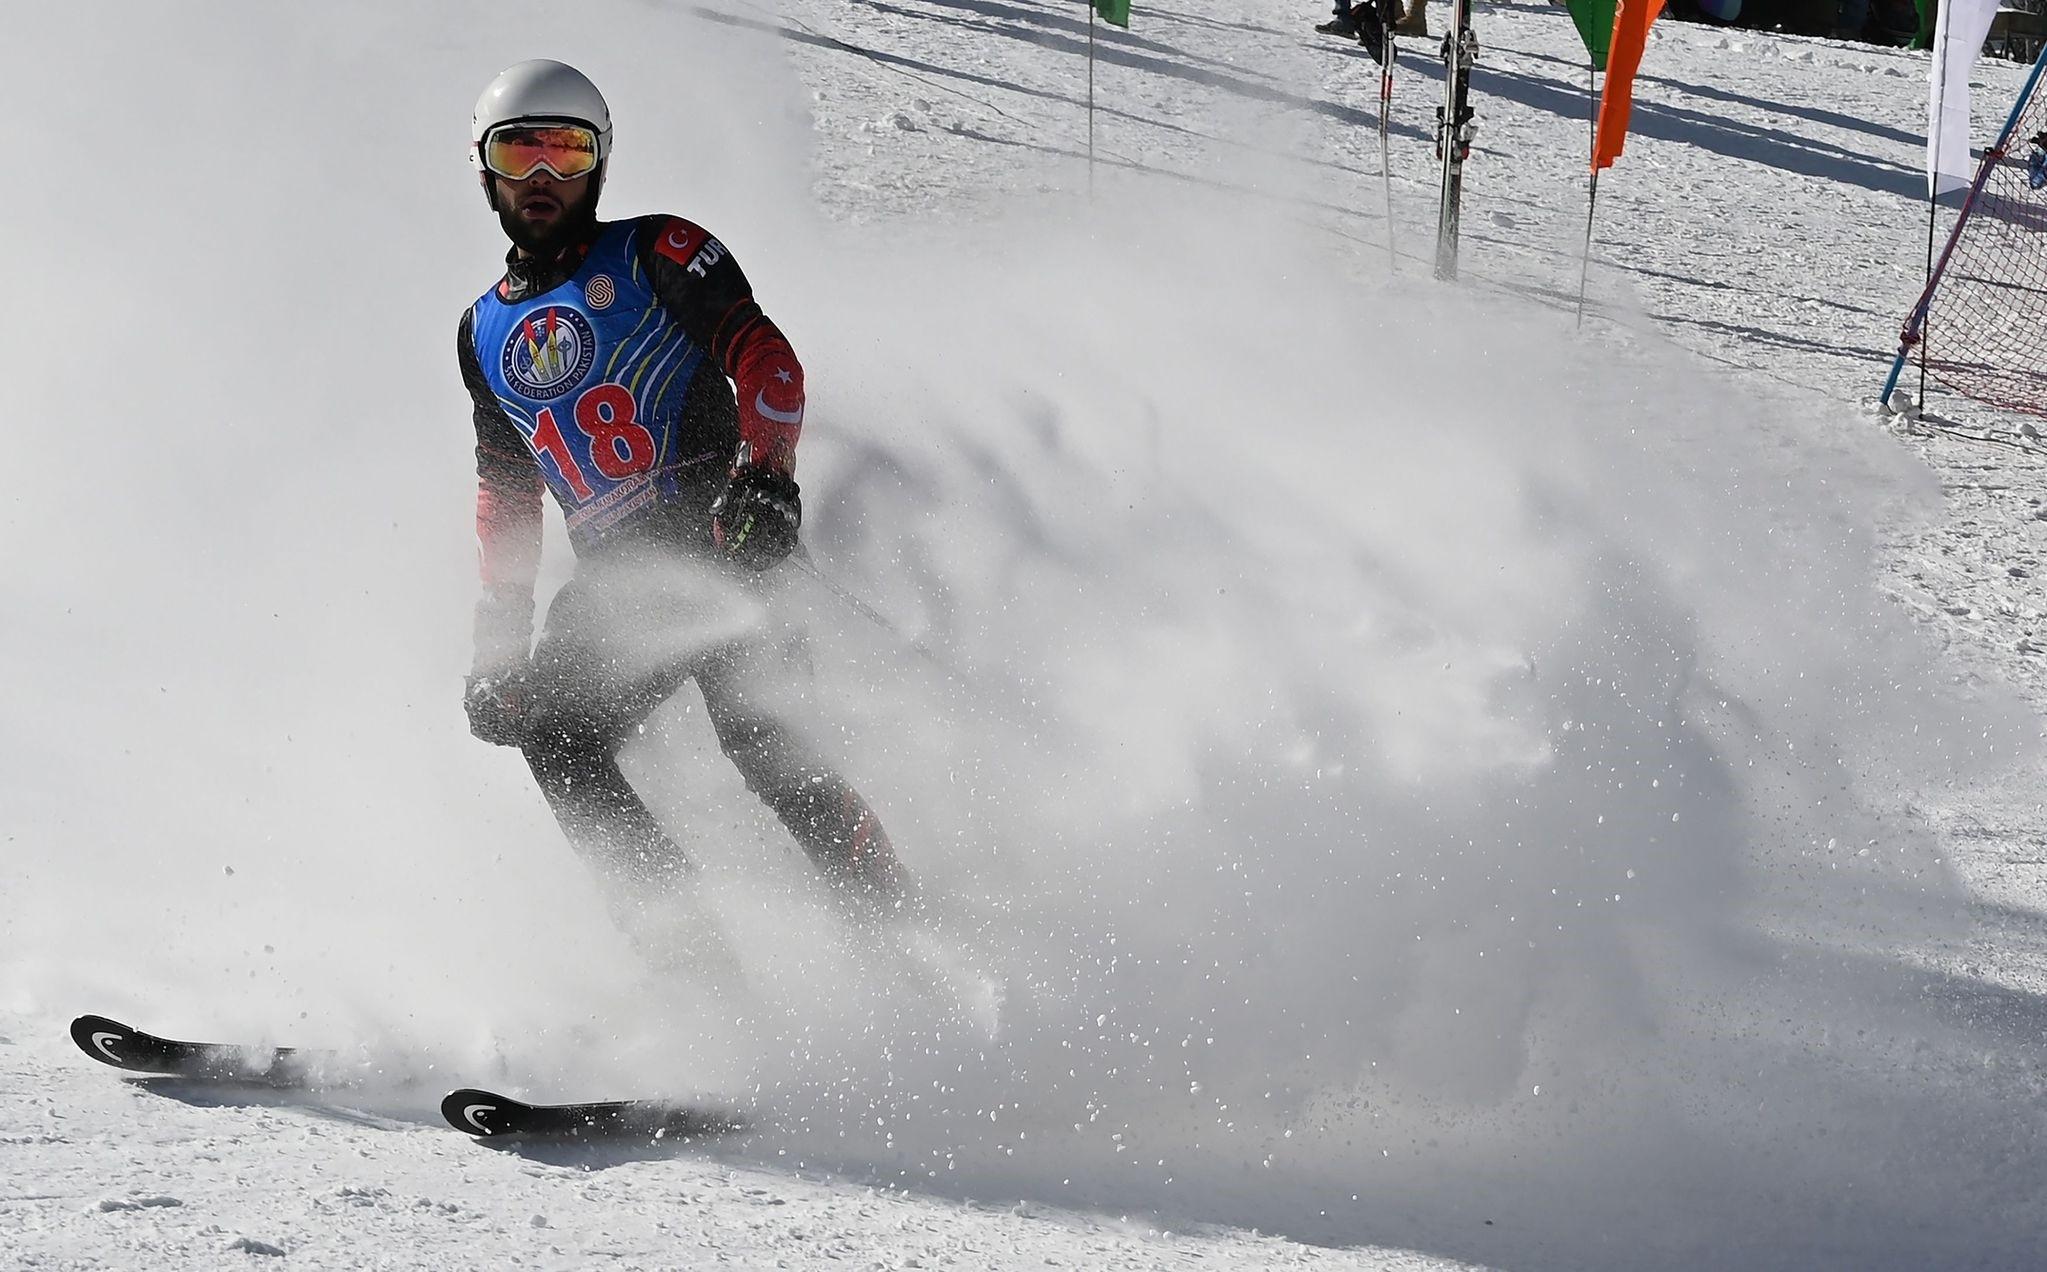 Turkish skier Berkin Usta takes part in an international alpine ski event in Naltar Ski Resort, Jan. 29, 2019.